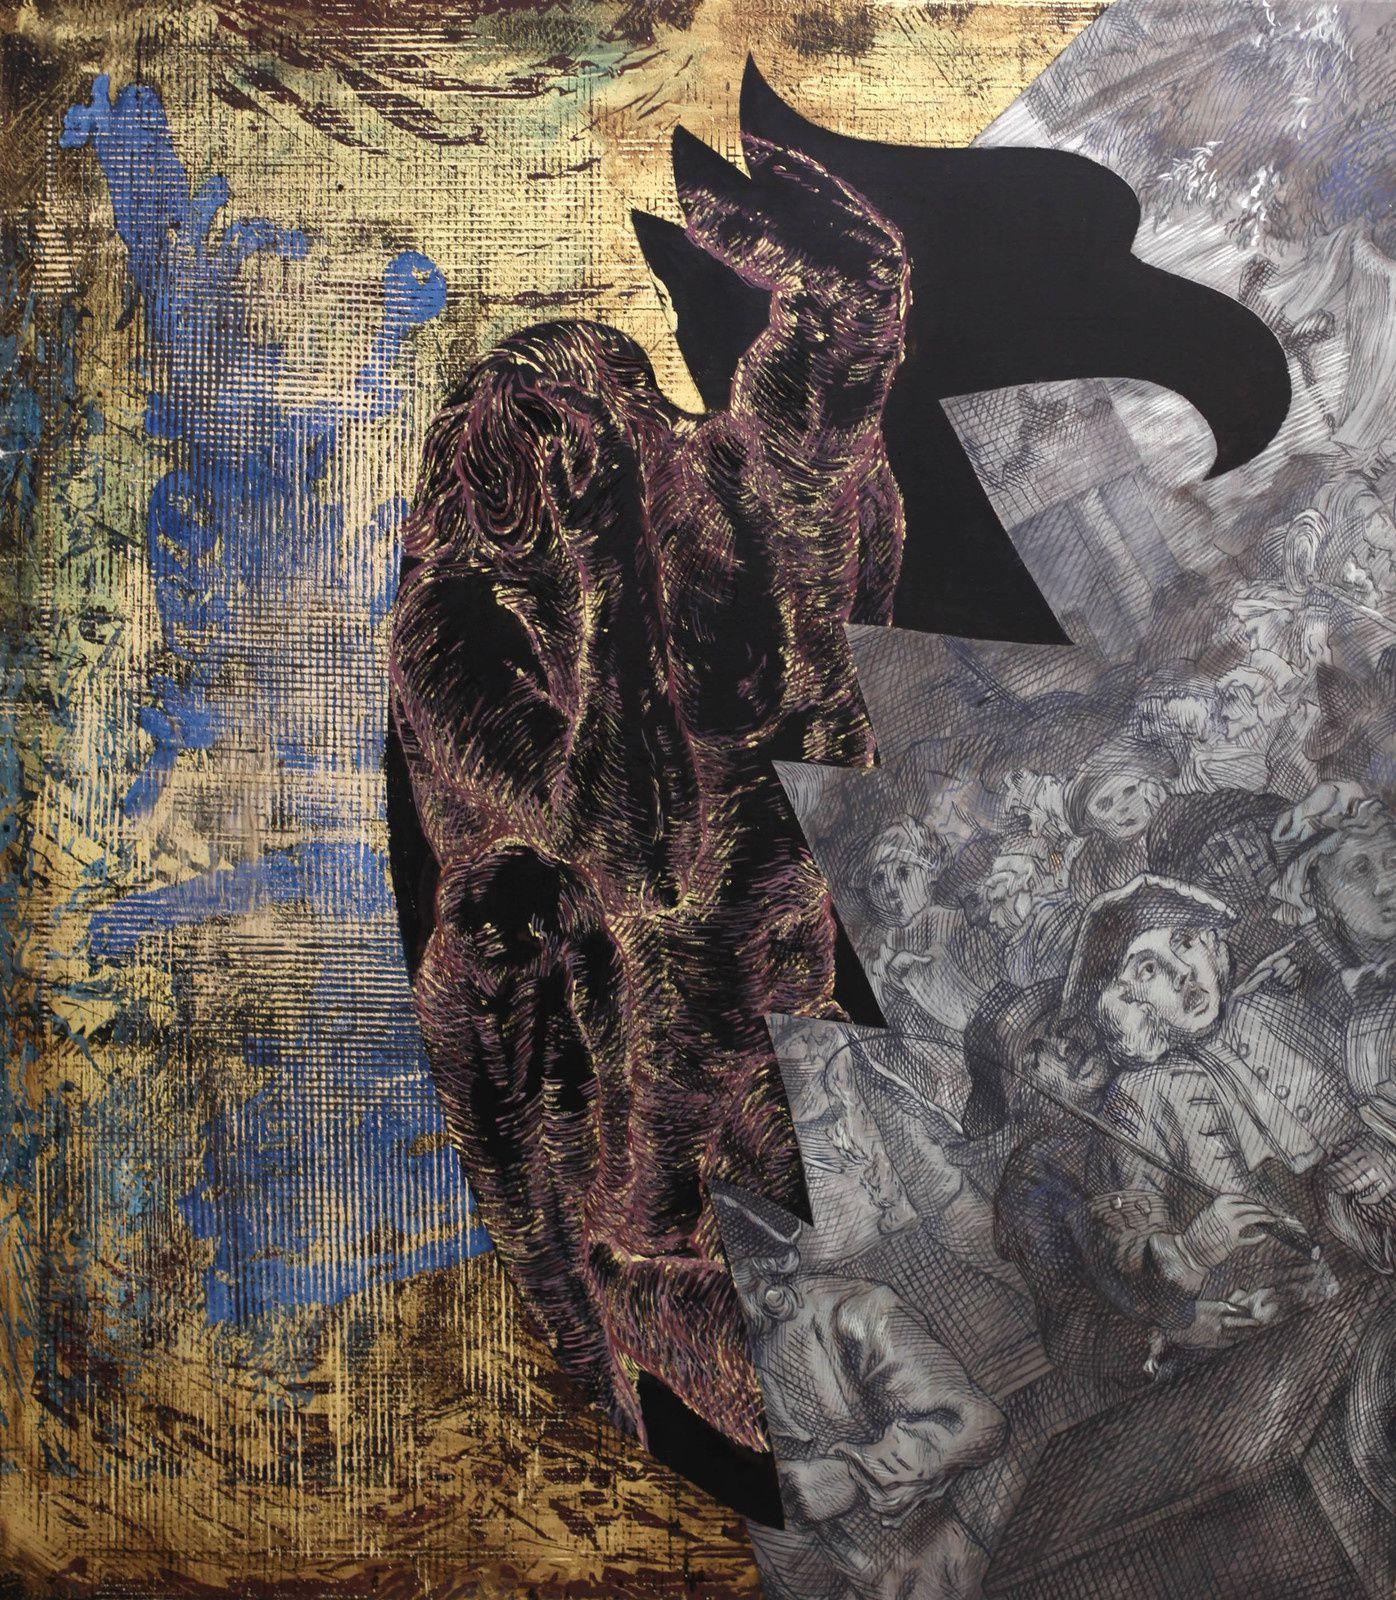 """Ohne Titel"", 2007 de Jörg IMMENDORFF - Courtesy Galerie Suzanne TARASIEVE © Photo Éric Simon"